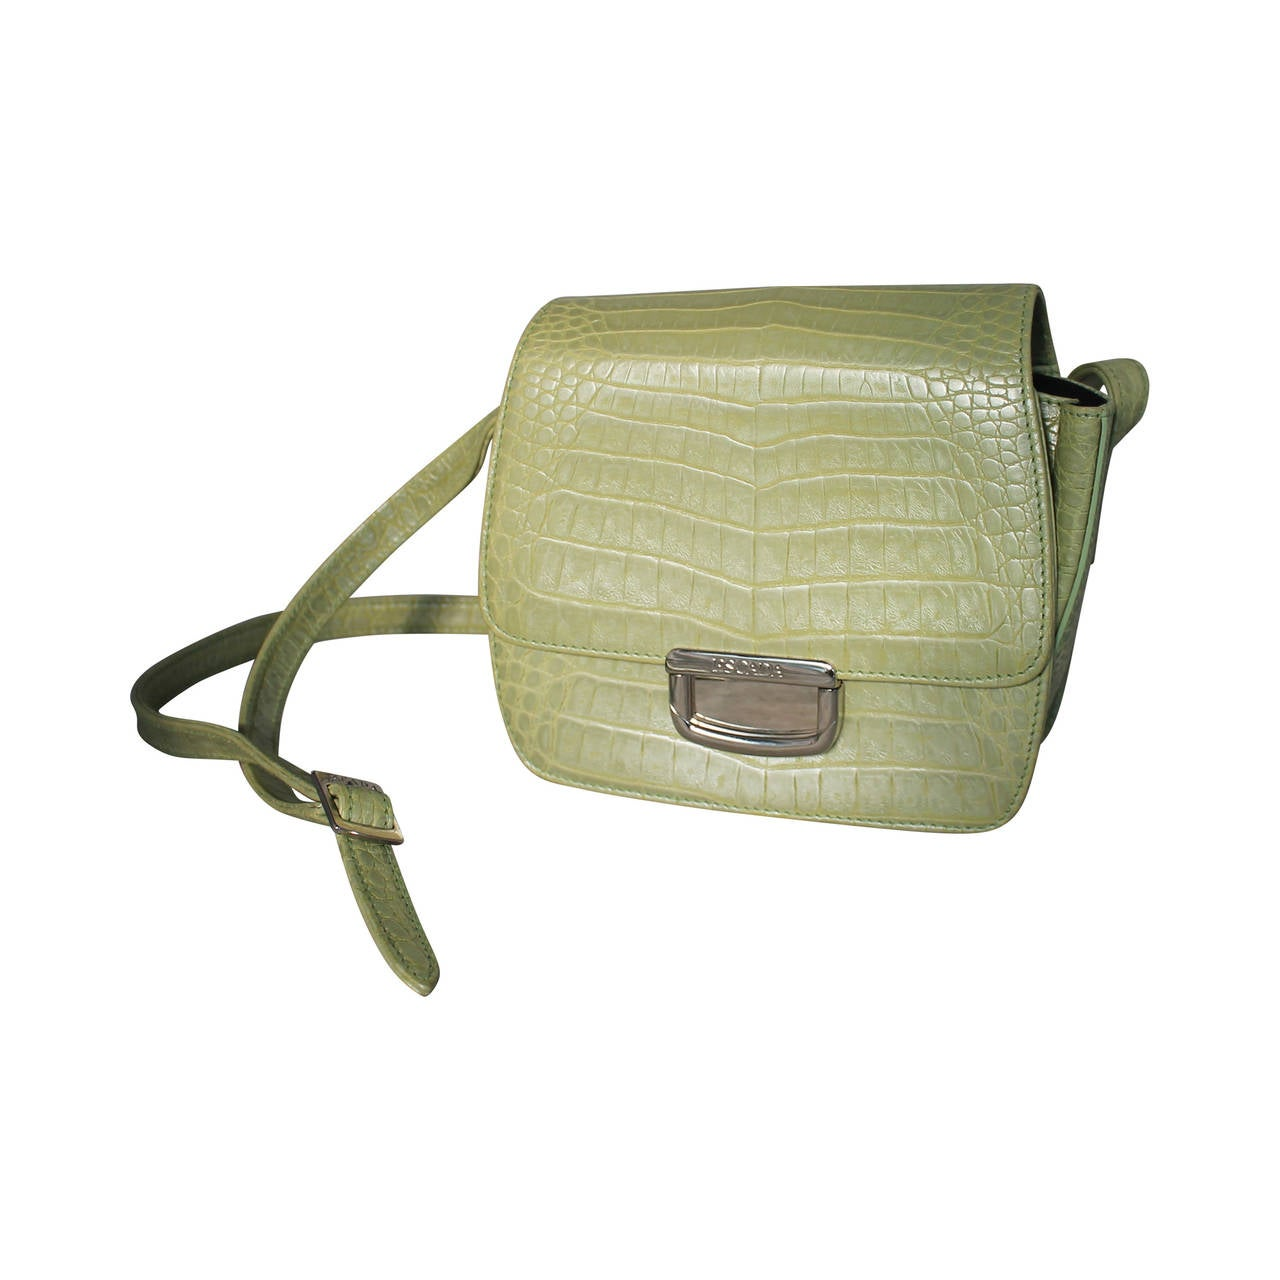 Escada Pearlized Green Croc Embossed Leather Handbag